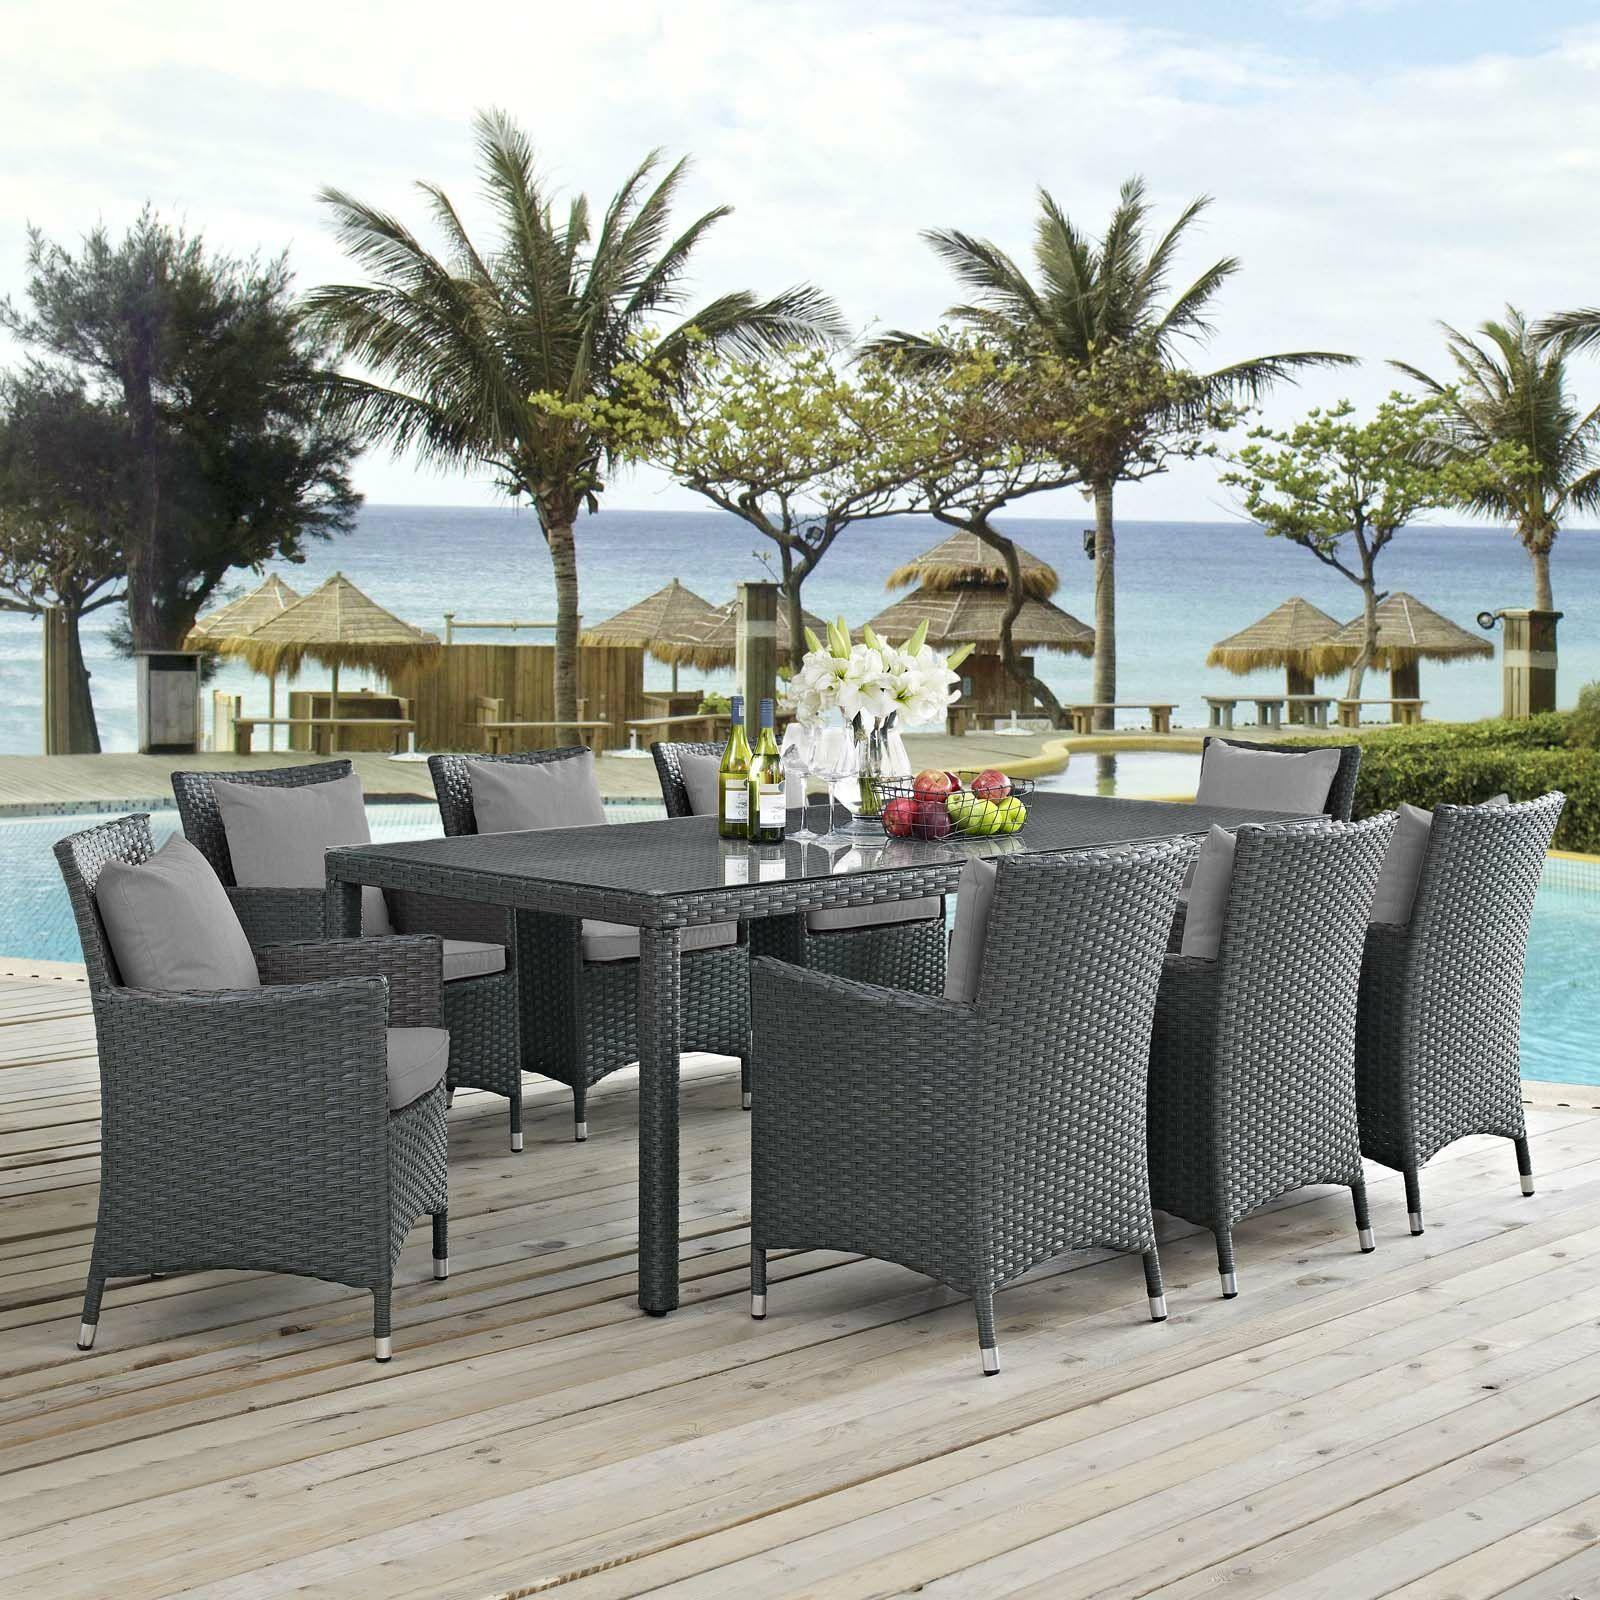 Tripp 9 Piece Dining Set with Sunbrella Cushions Cushion Color: Gray